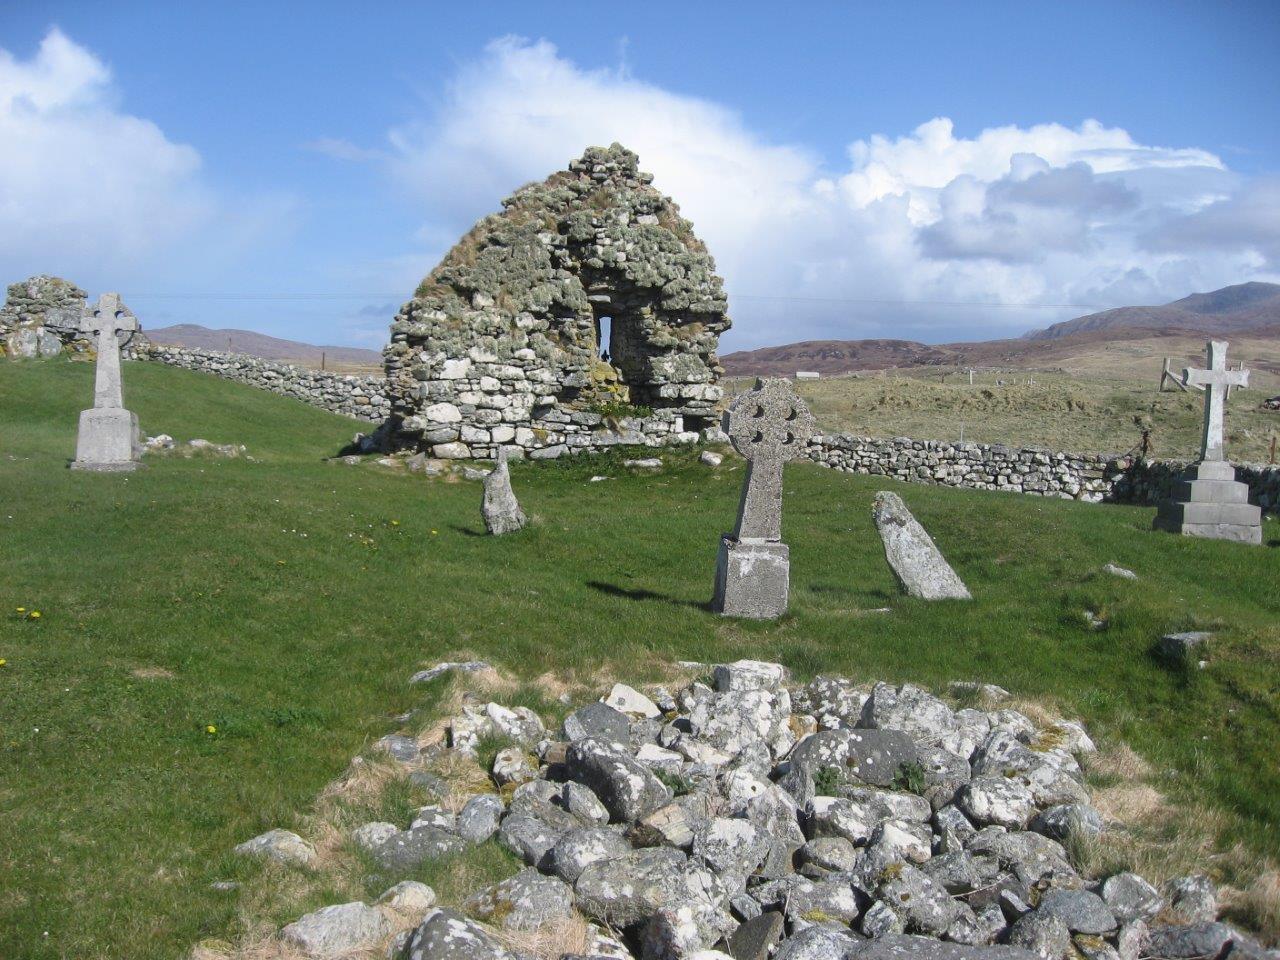 Howmore graveyard ruins